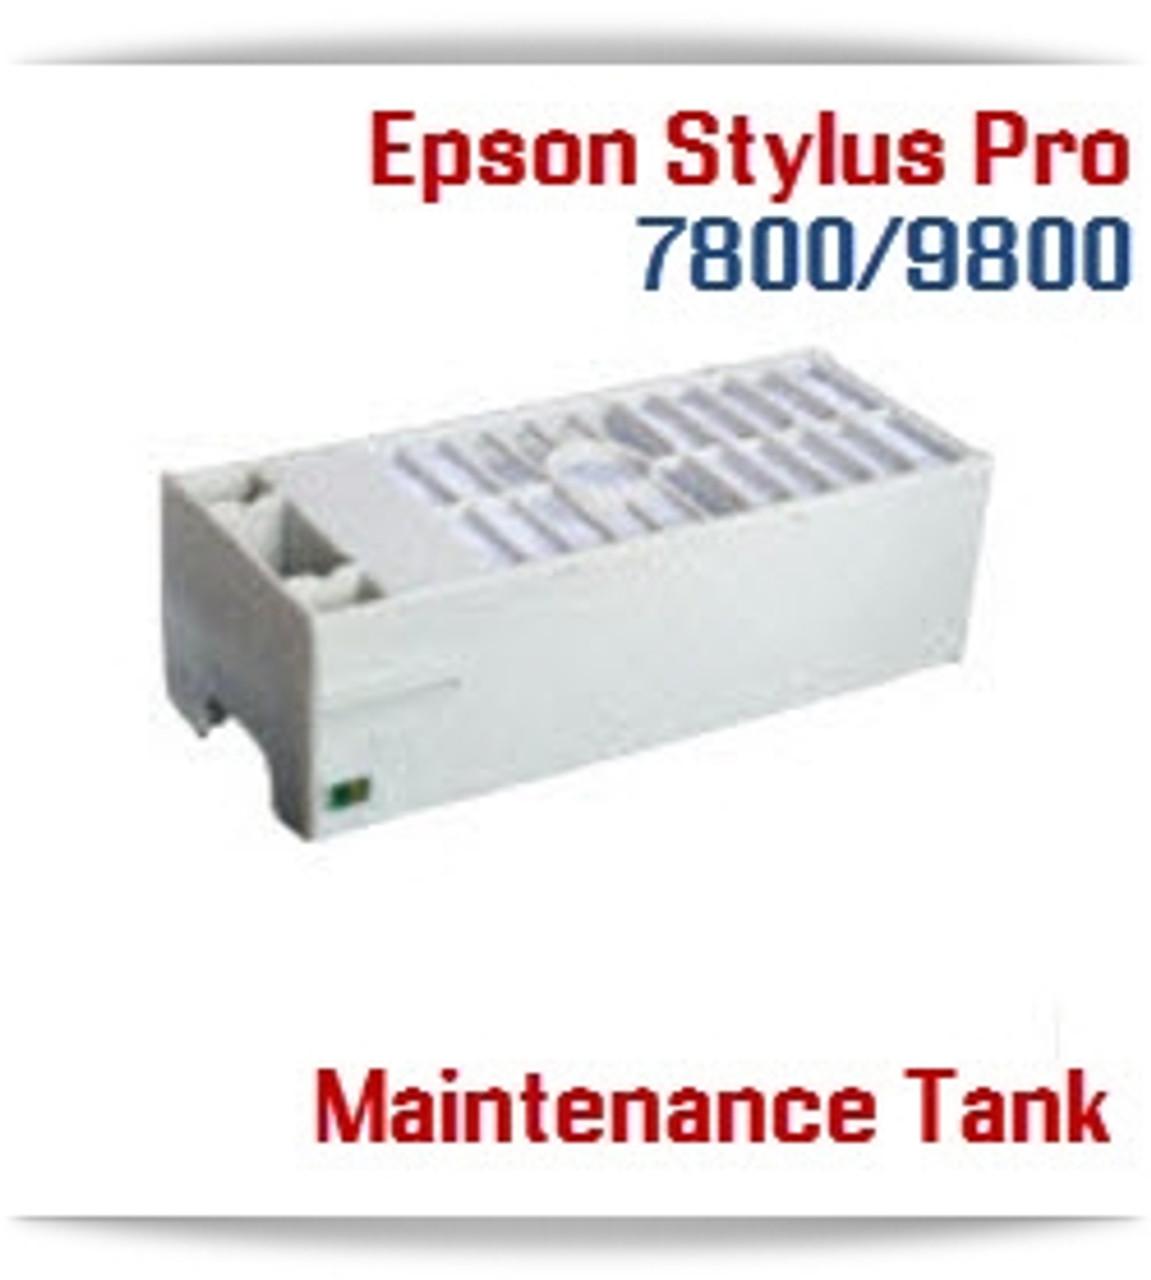 Maintenance Tank Epson Stylus Pro 7800, 9800 printer